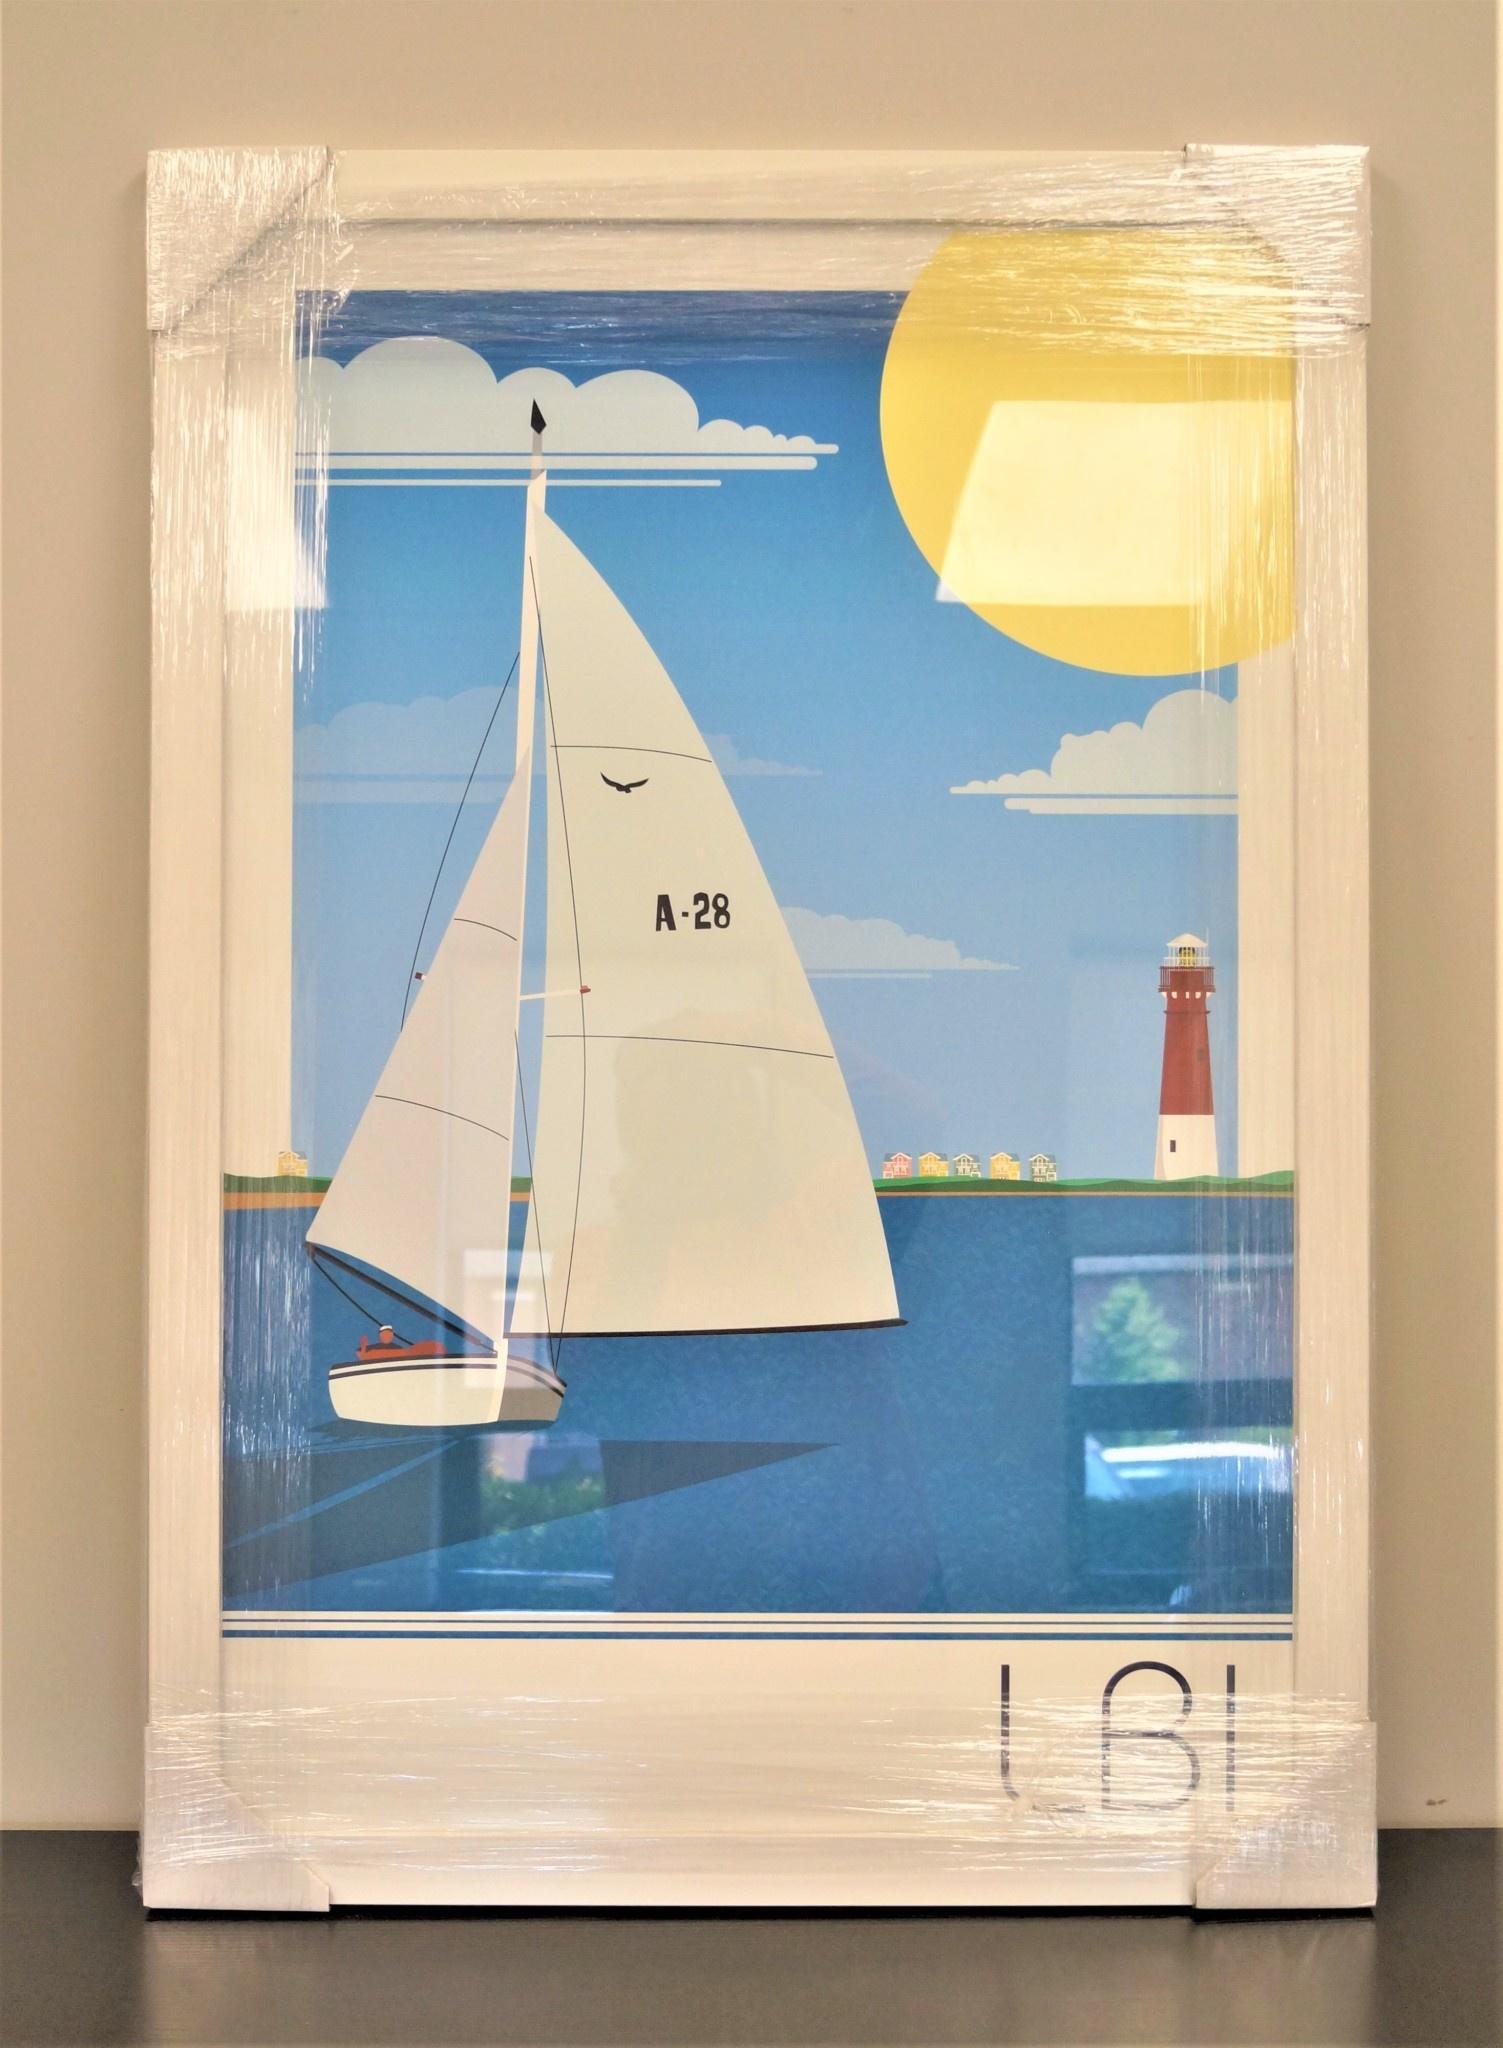 LBI Sailboat 24x36 White Frame